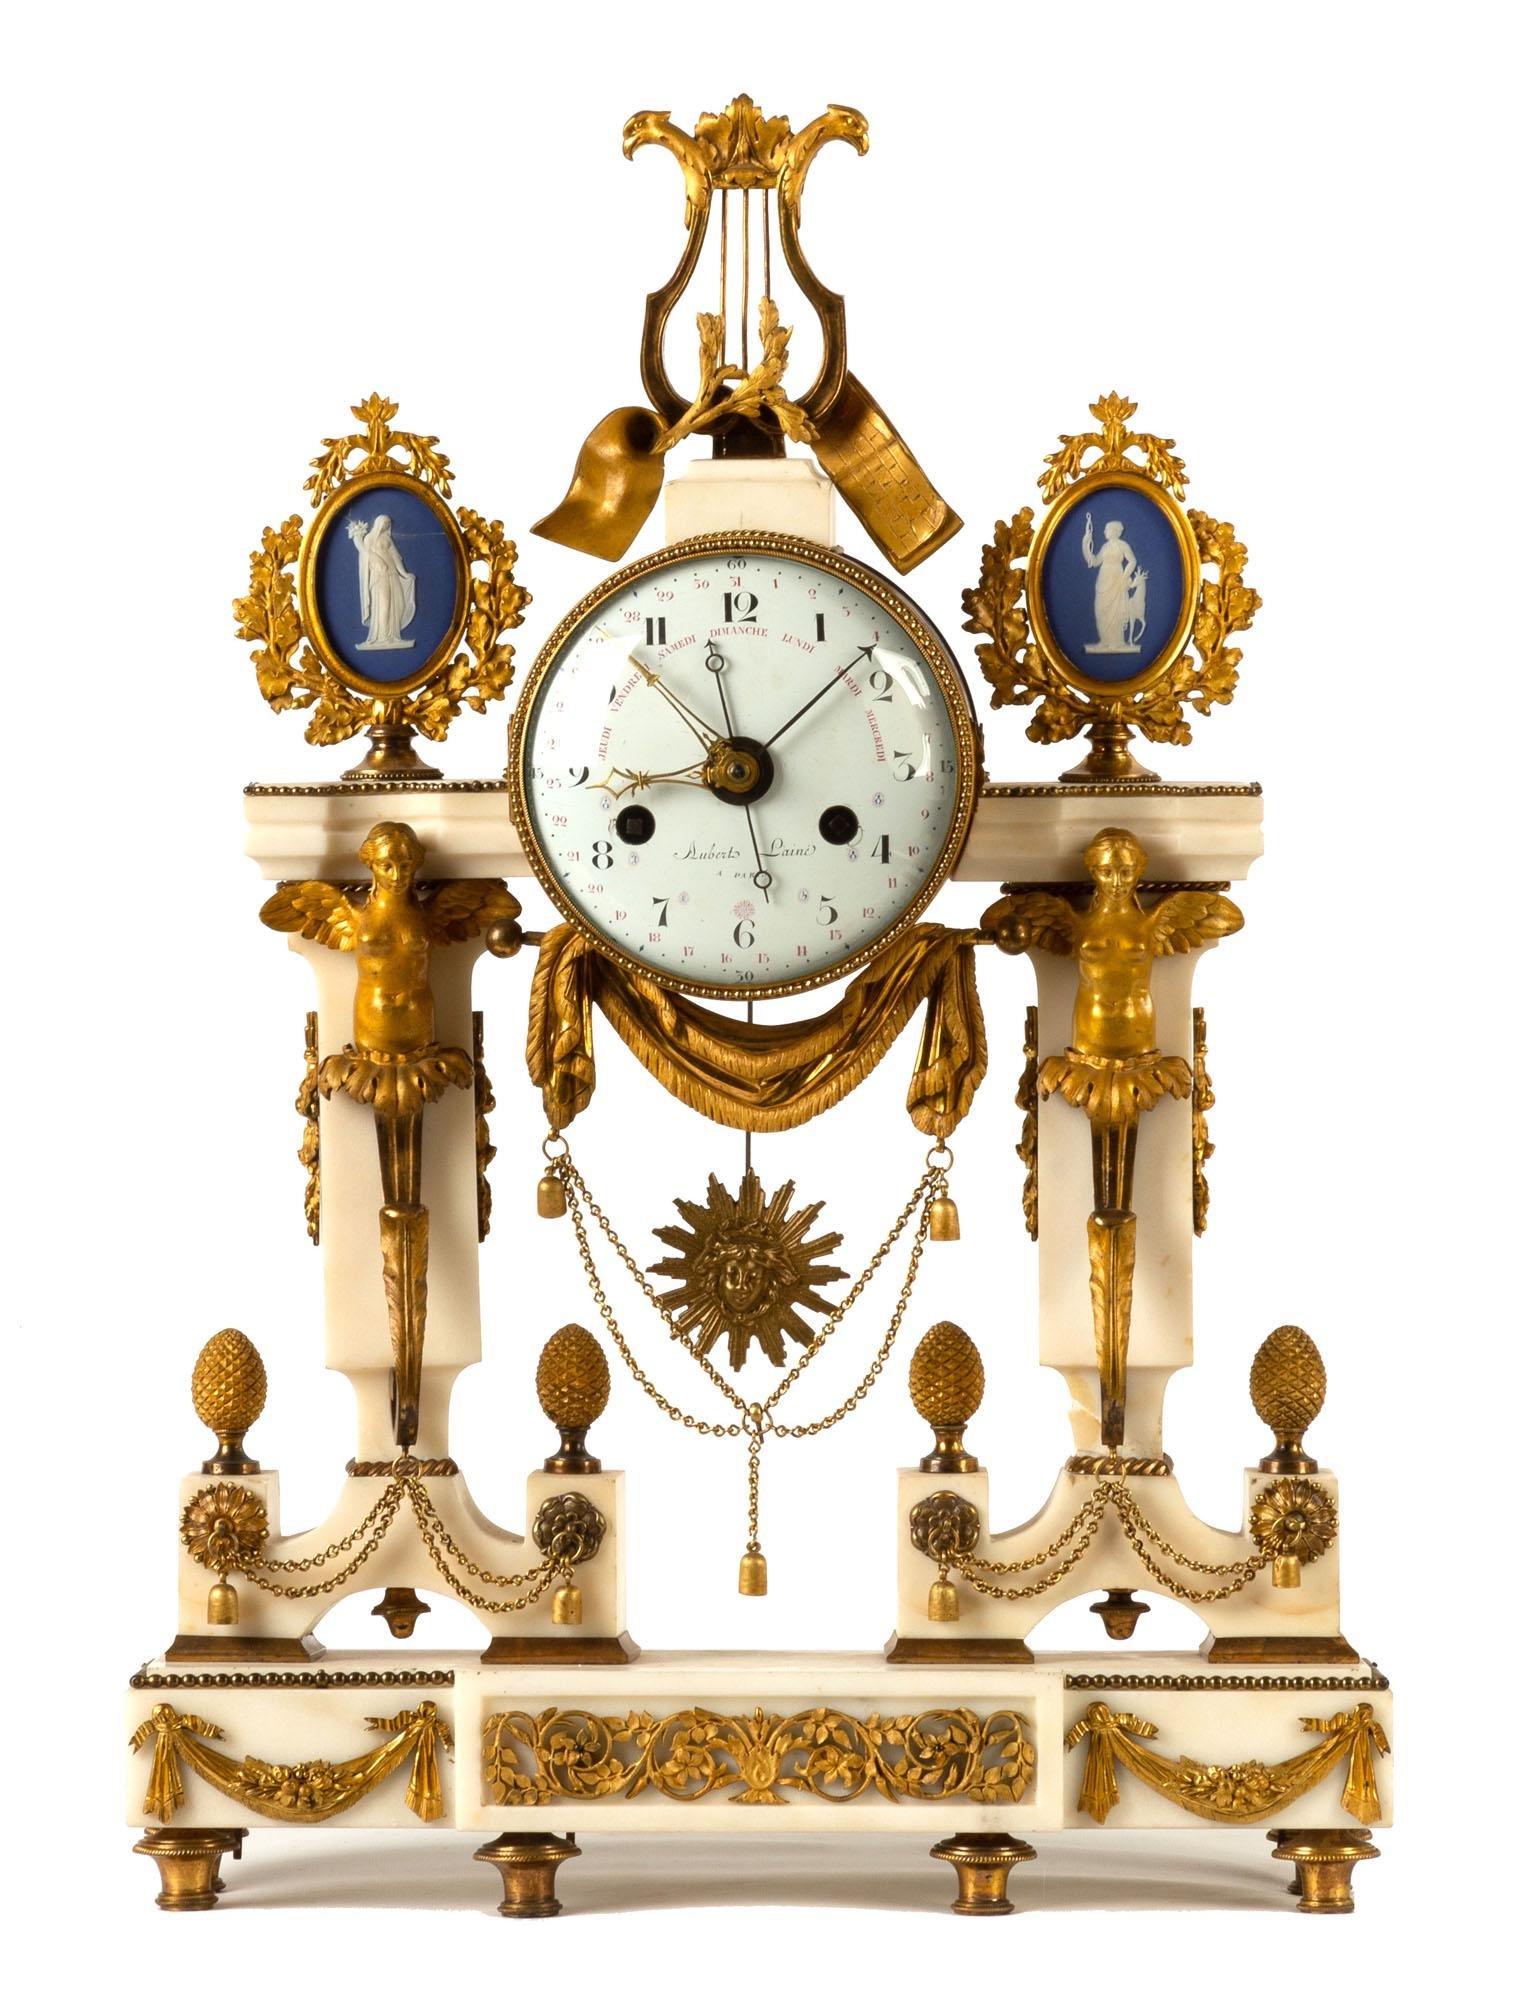 A Louis XVI Ormolu Mantel Clock By Imbert L'aine